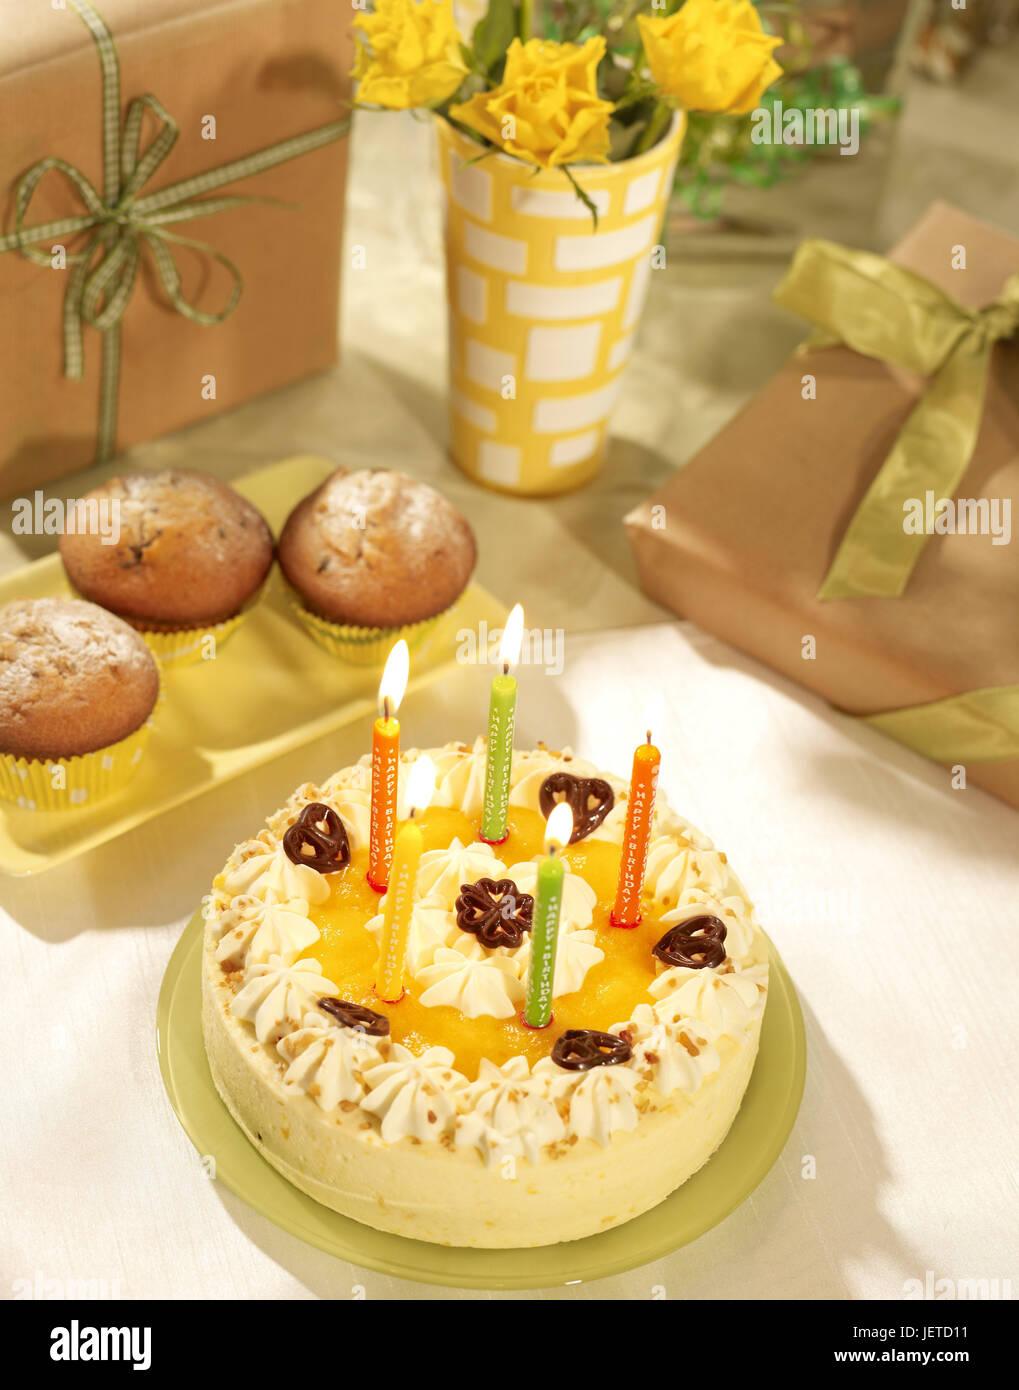 Birthday Cake Skyers Muffin Flowers Cakes Cream Gateau Tangerine Malice Fruit Pieces Five Brightly Burn